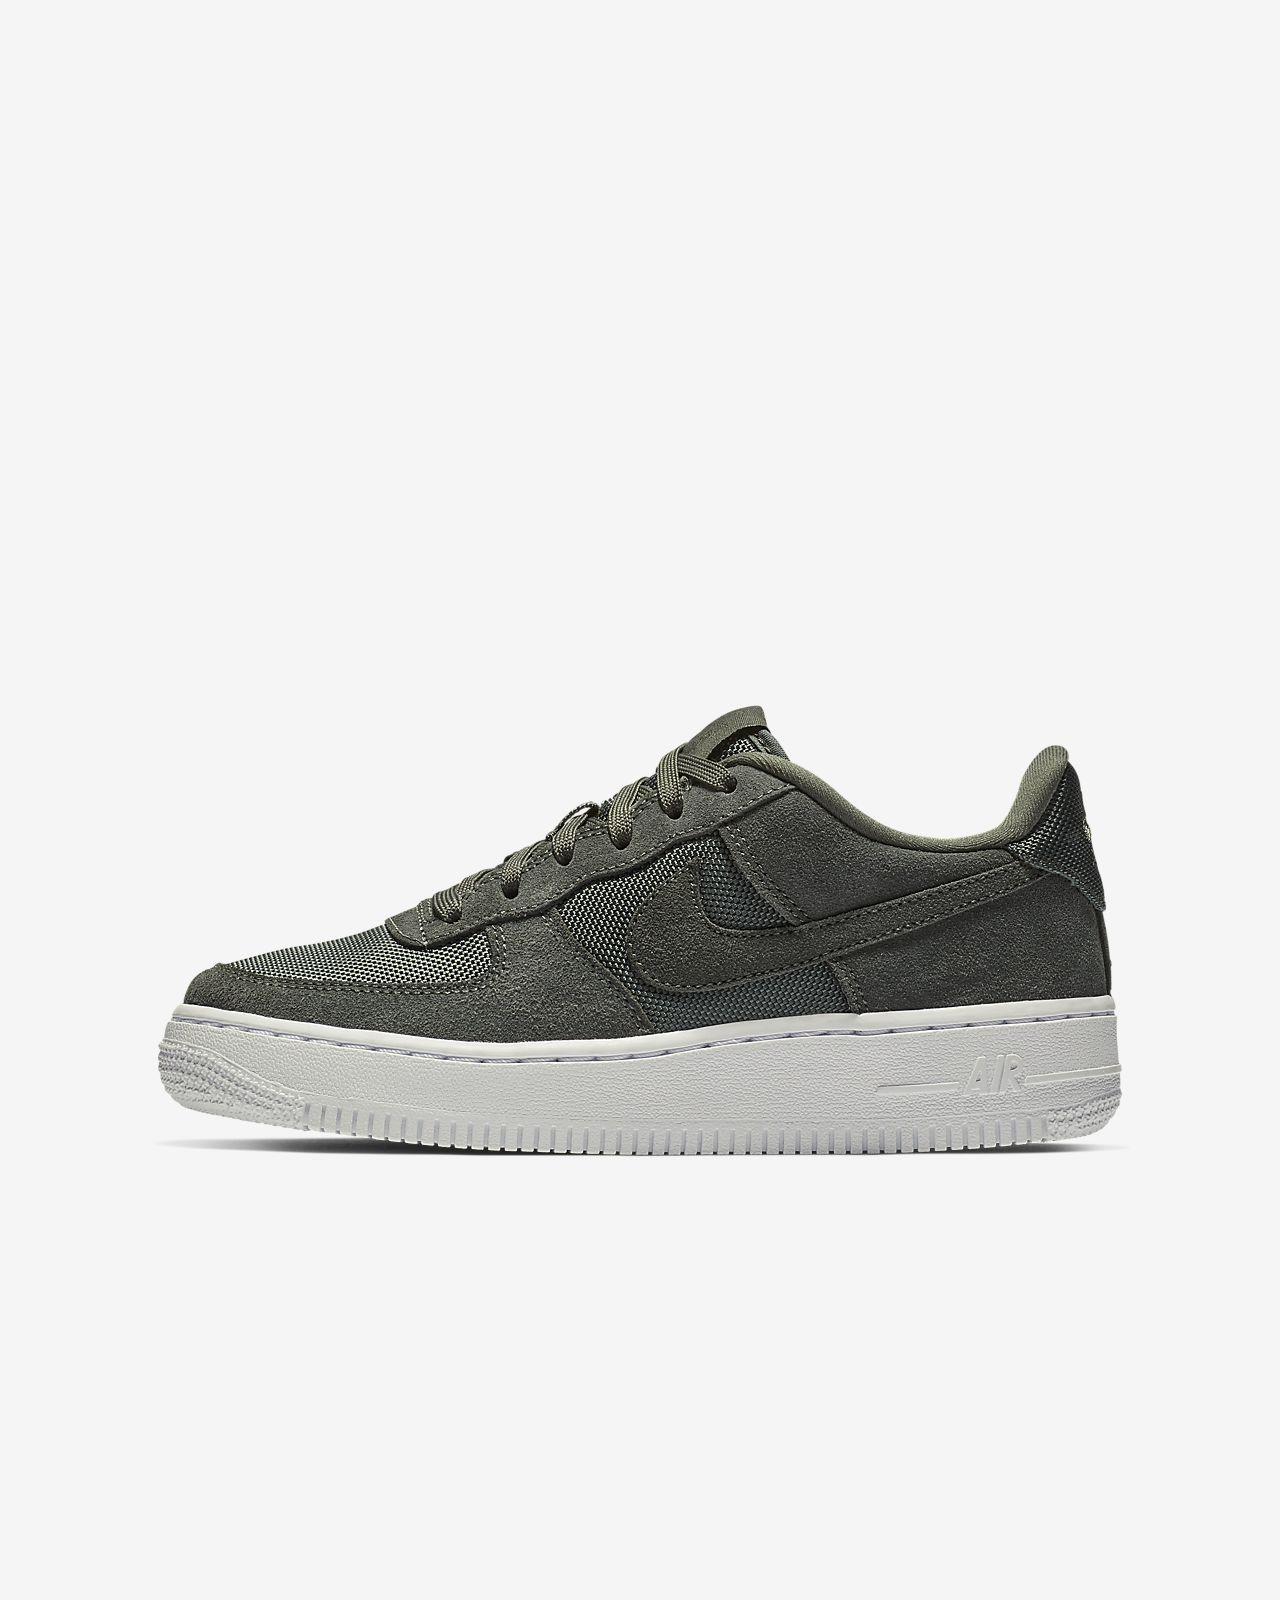 Nike Air Force 1 1 Schuh für ältere Kinder